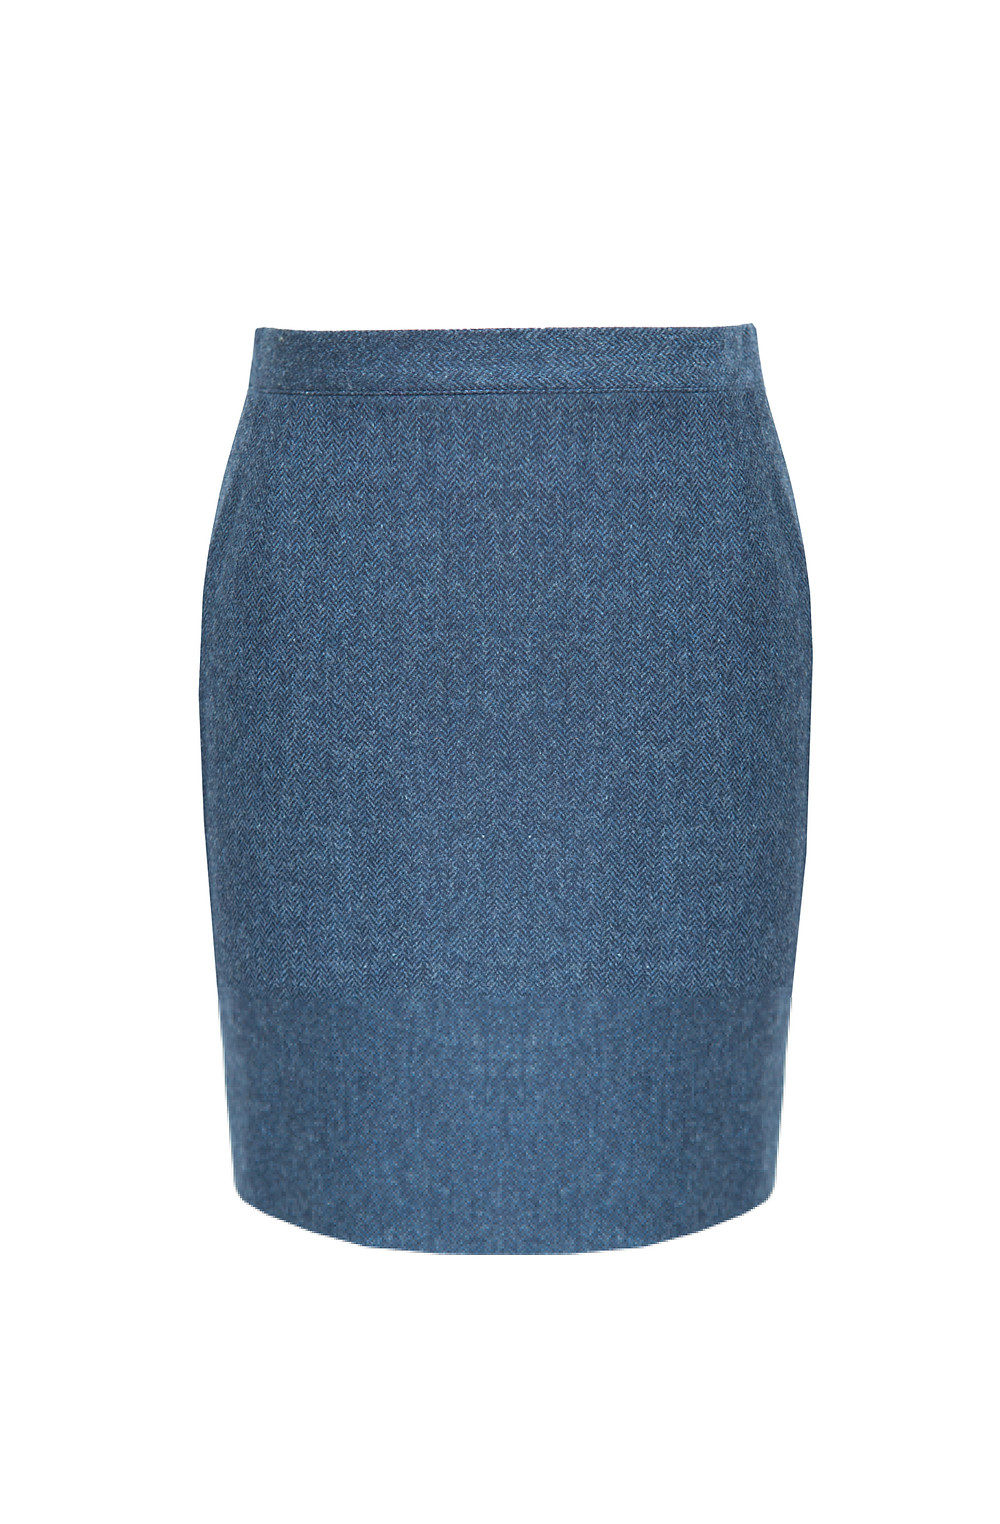 Clara short skirt in dark sapphire